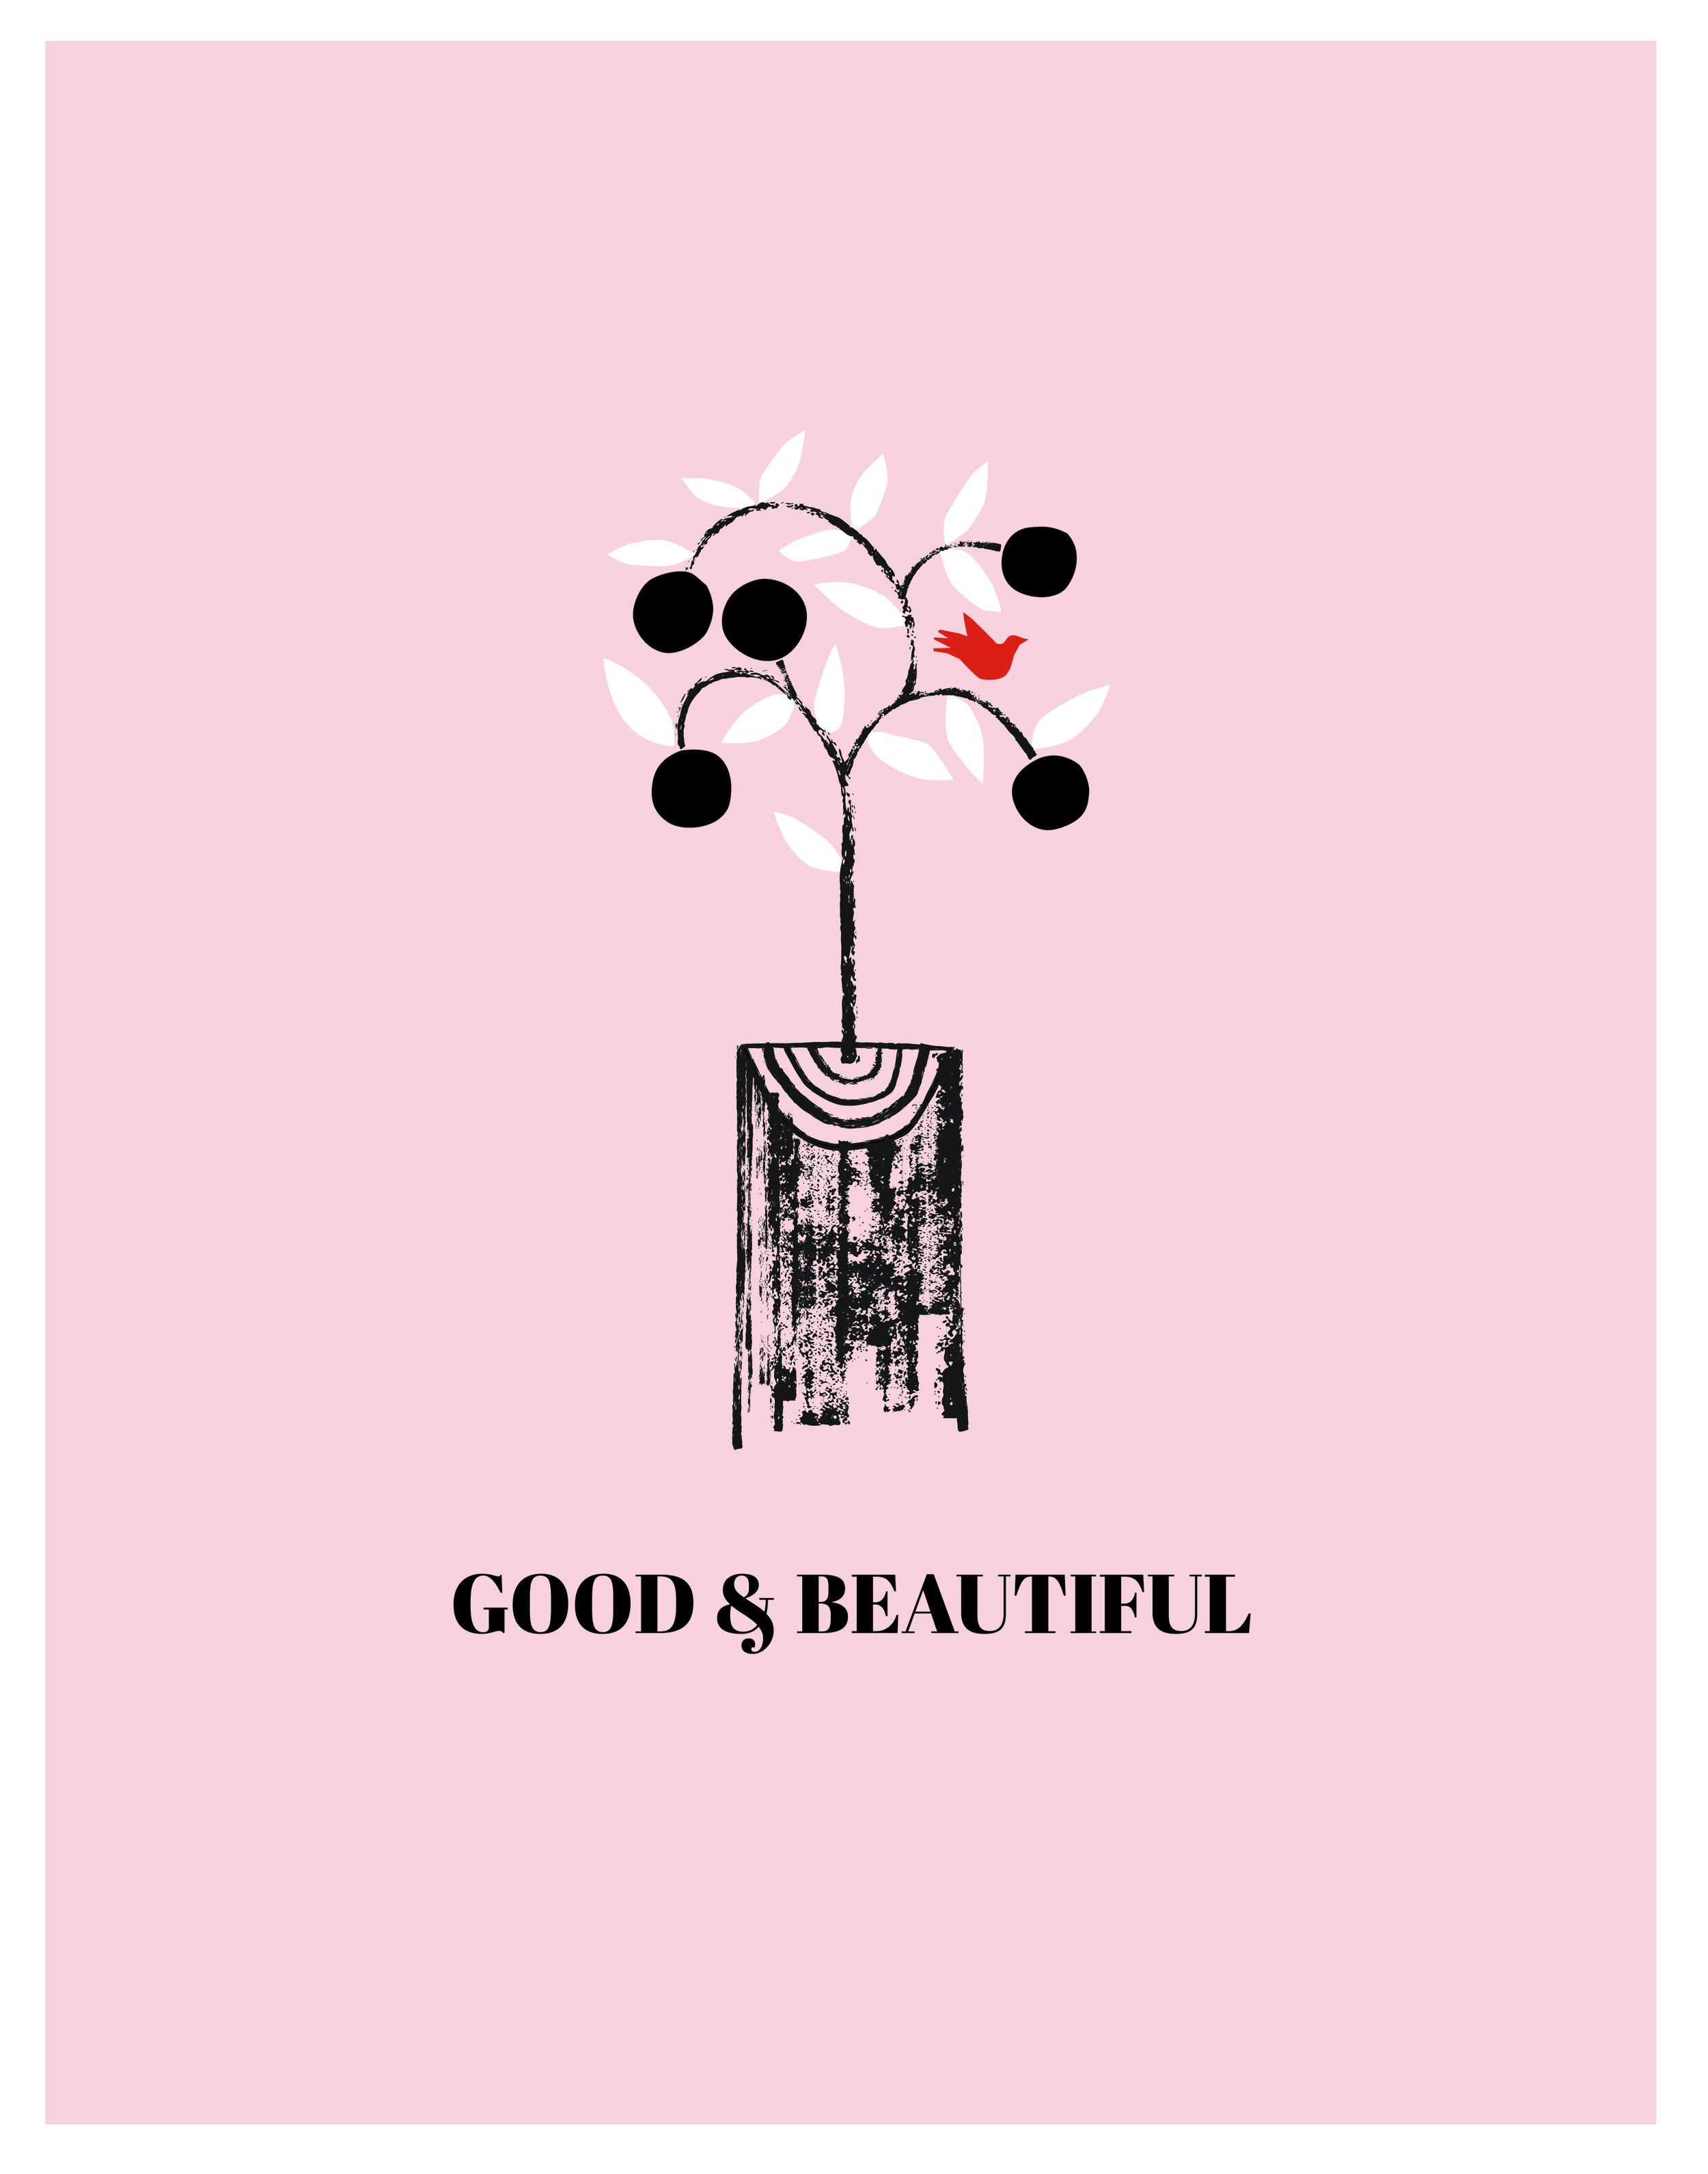 Good&Beautiful Print 11x14 Pink-01.jpg